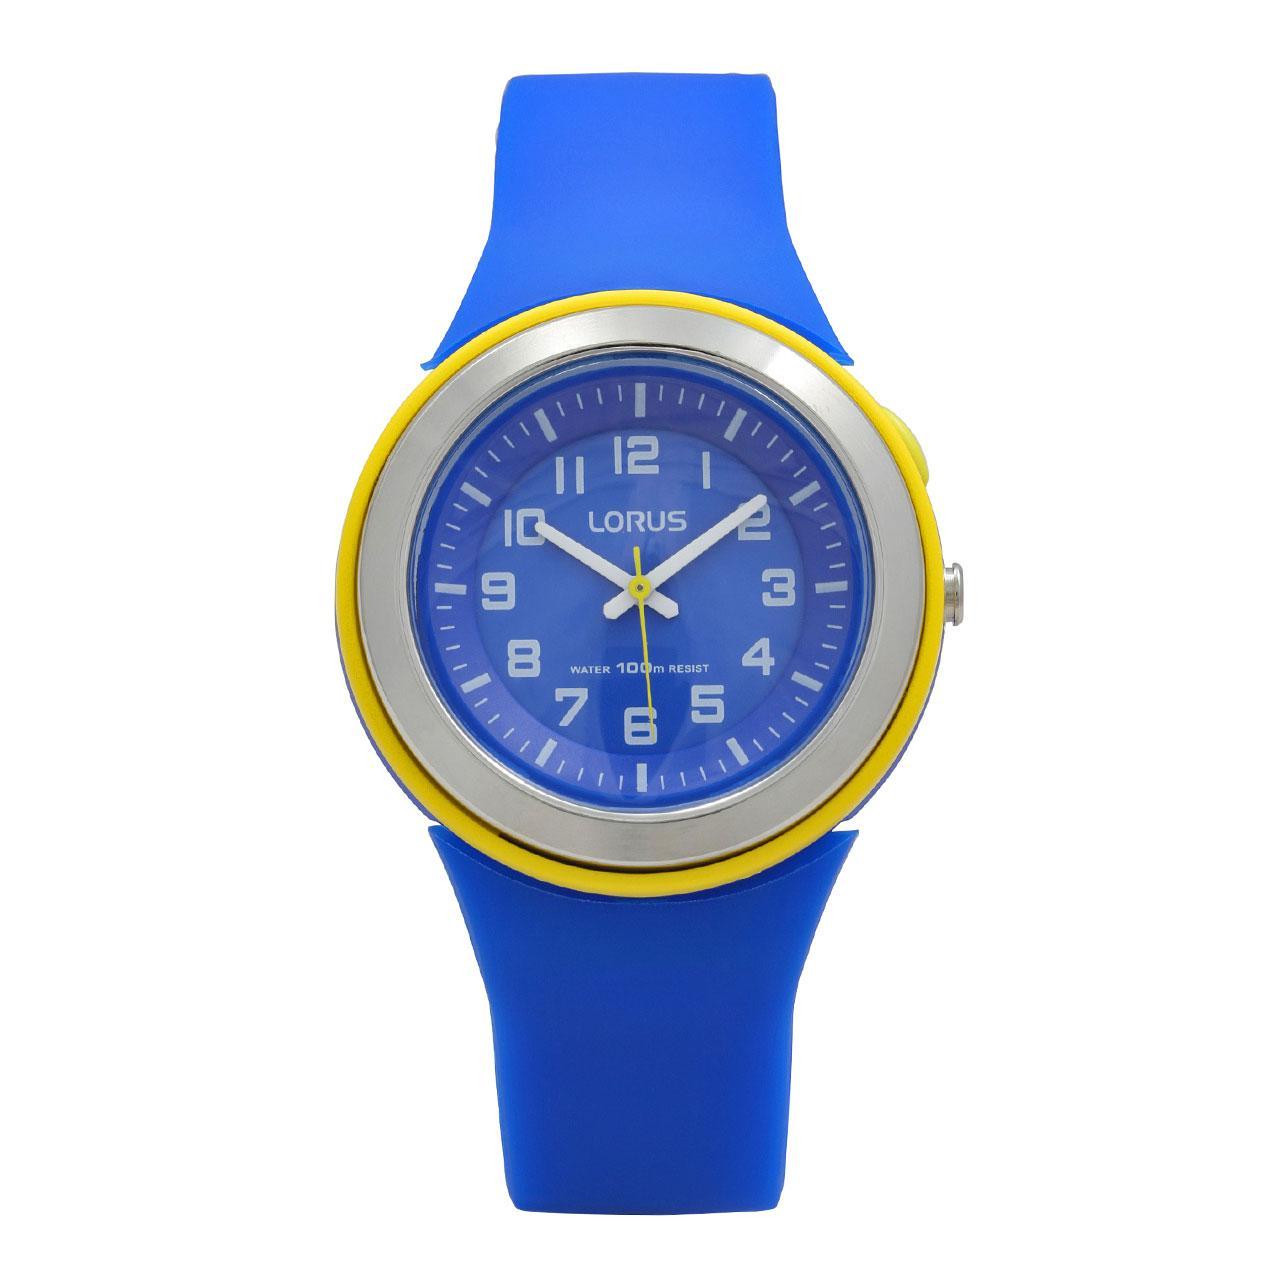 LORUS Jam Tangan Wanita - Blue Yellow - Silicon - R2307MX9